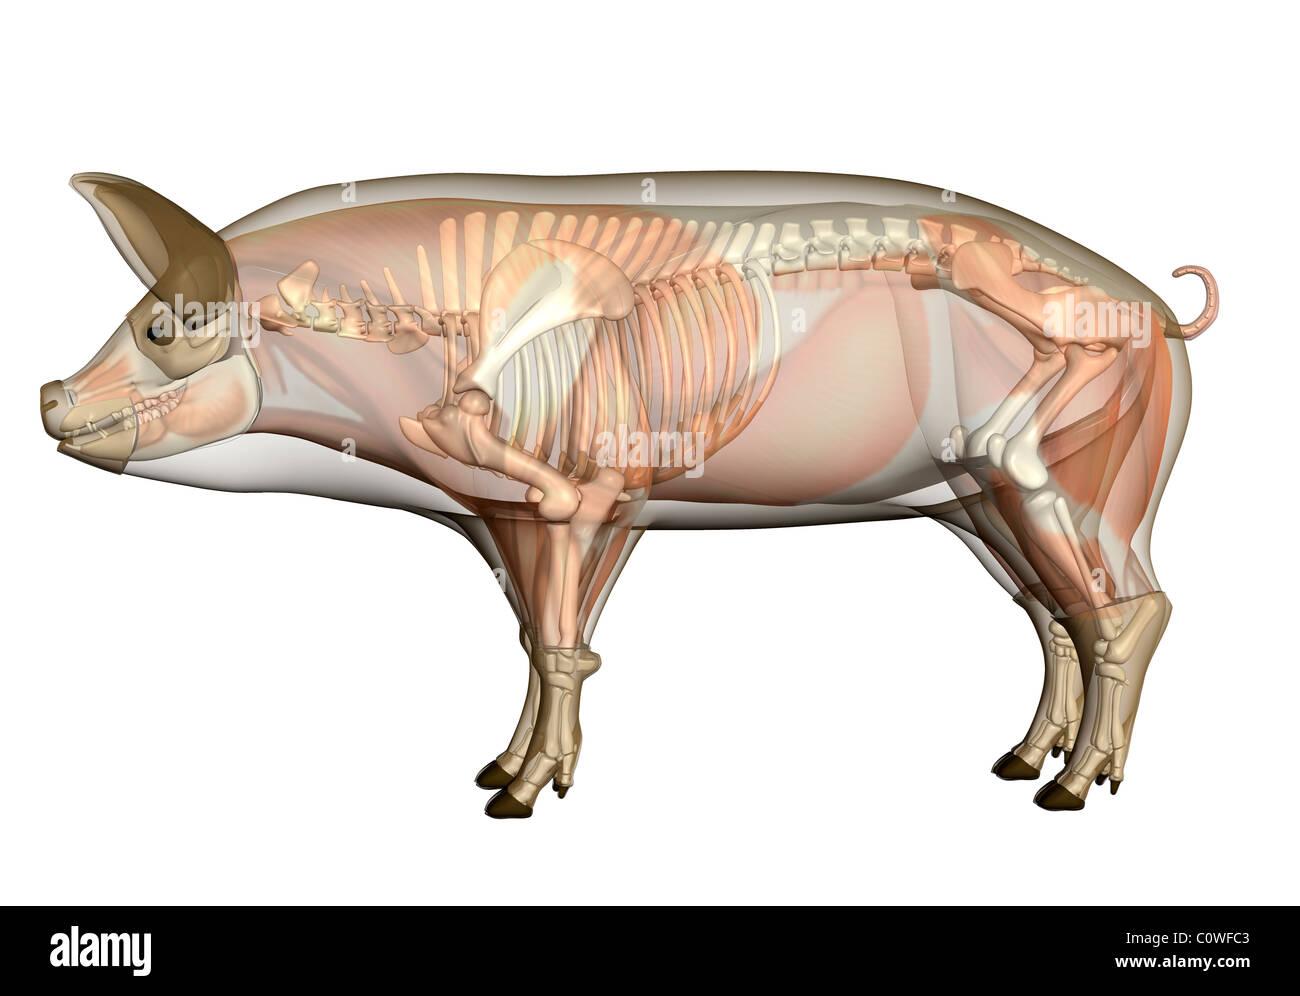 Pig anatomy vs human anatomy